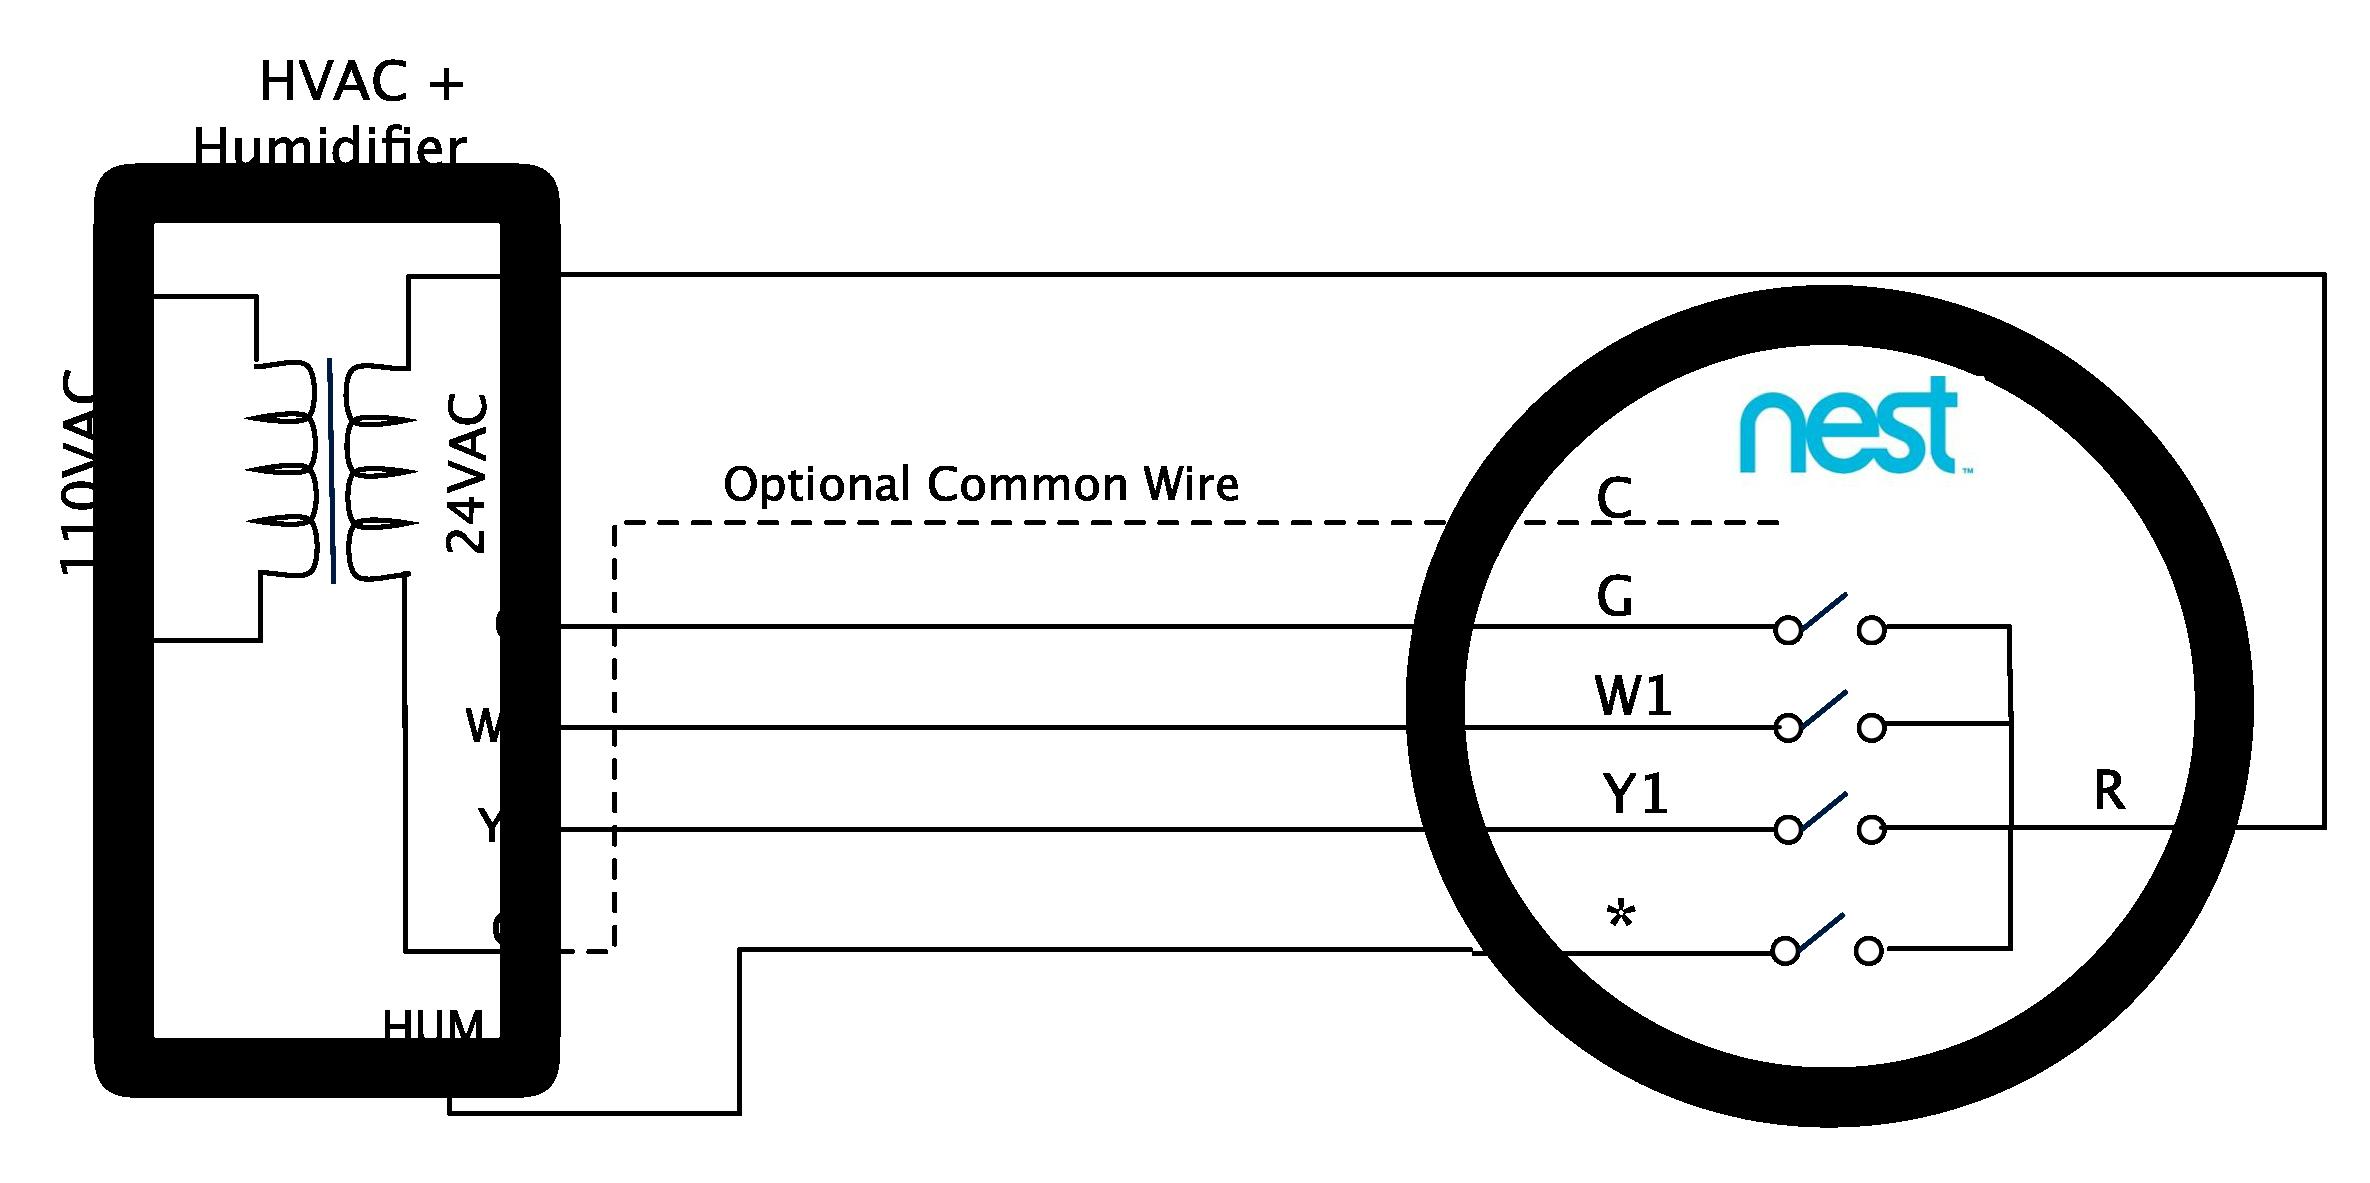 Latest Onstar Wiring Diagram